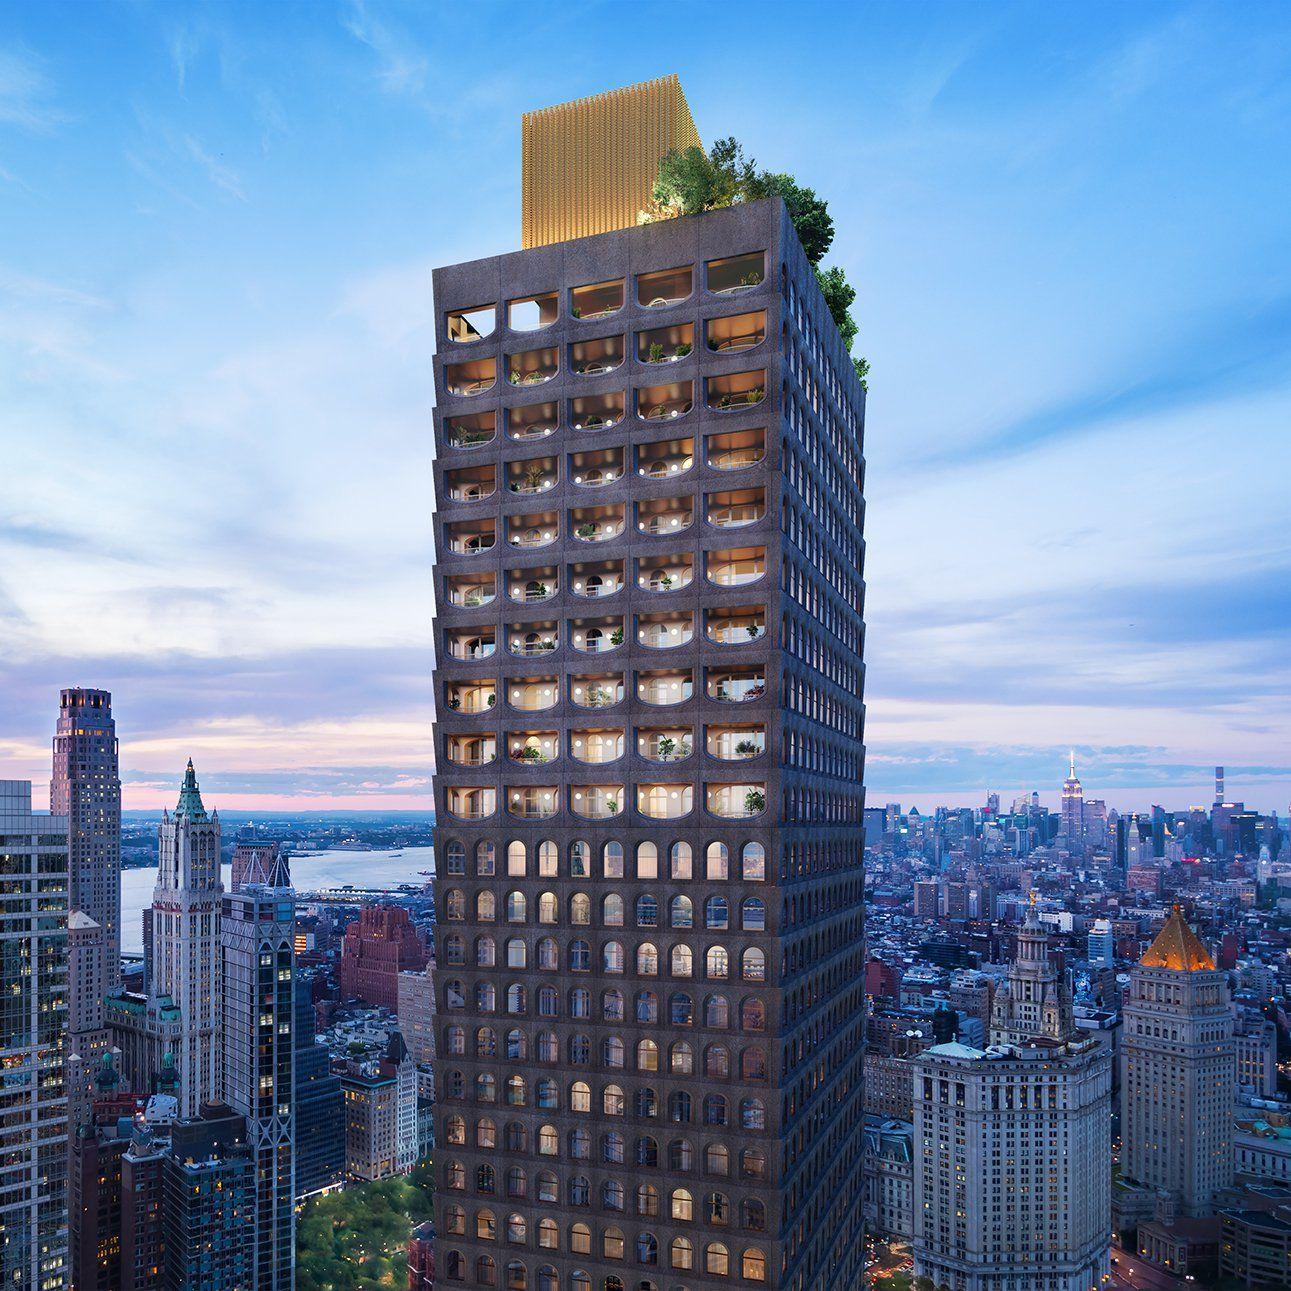 adjaye david york william 130 skyscraper glass brick stone projects tower architects facades architecture manhattan concrete dezeen building nyc buildings